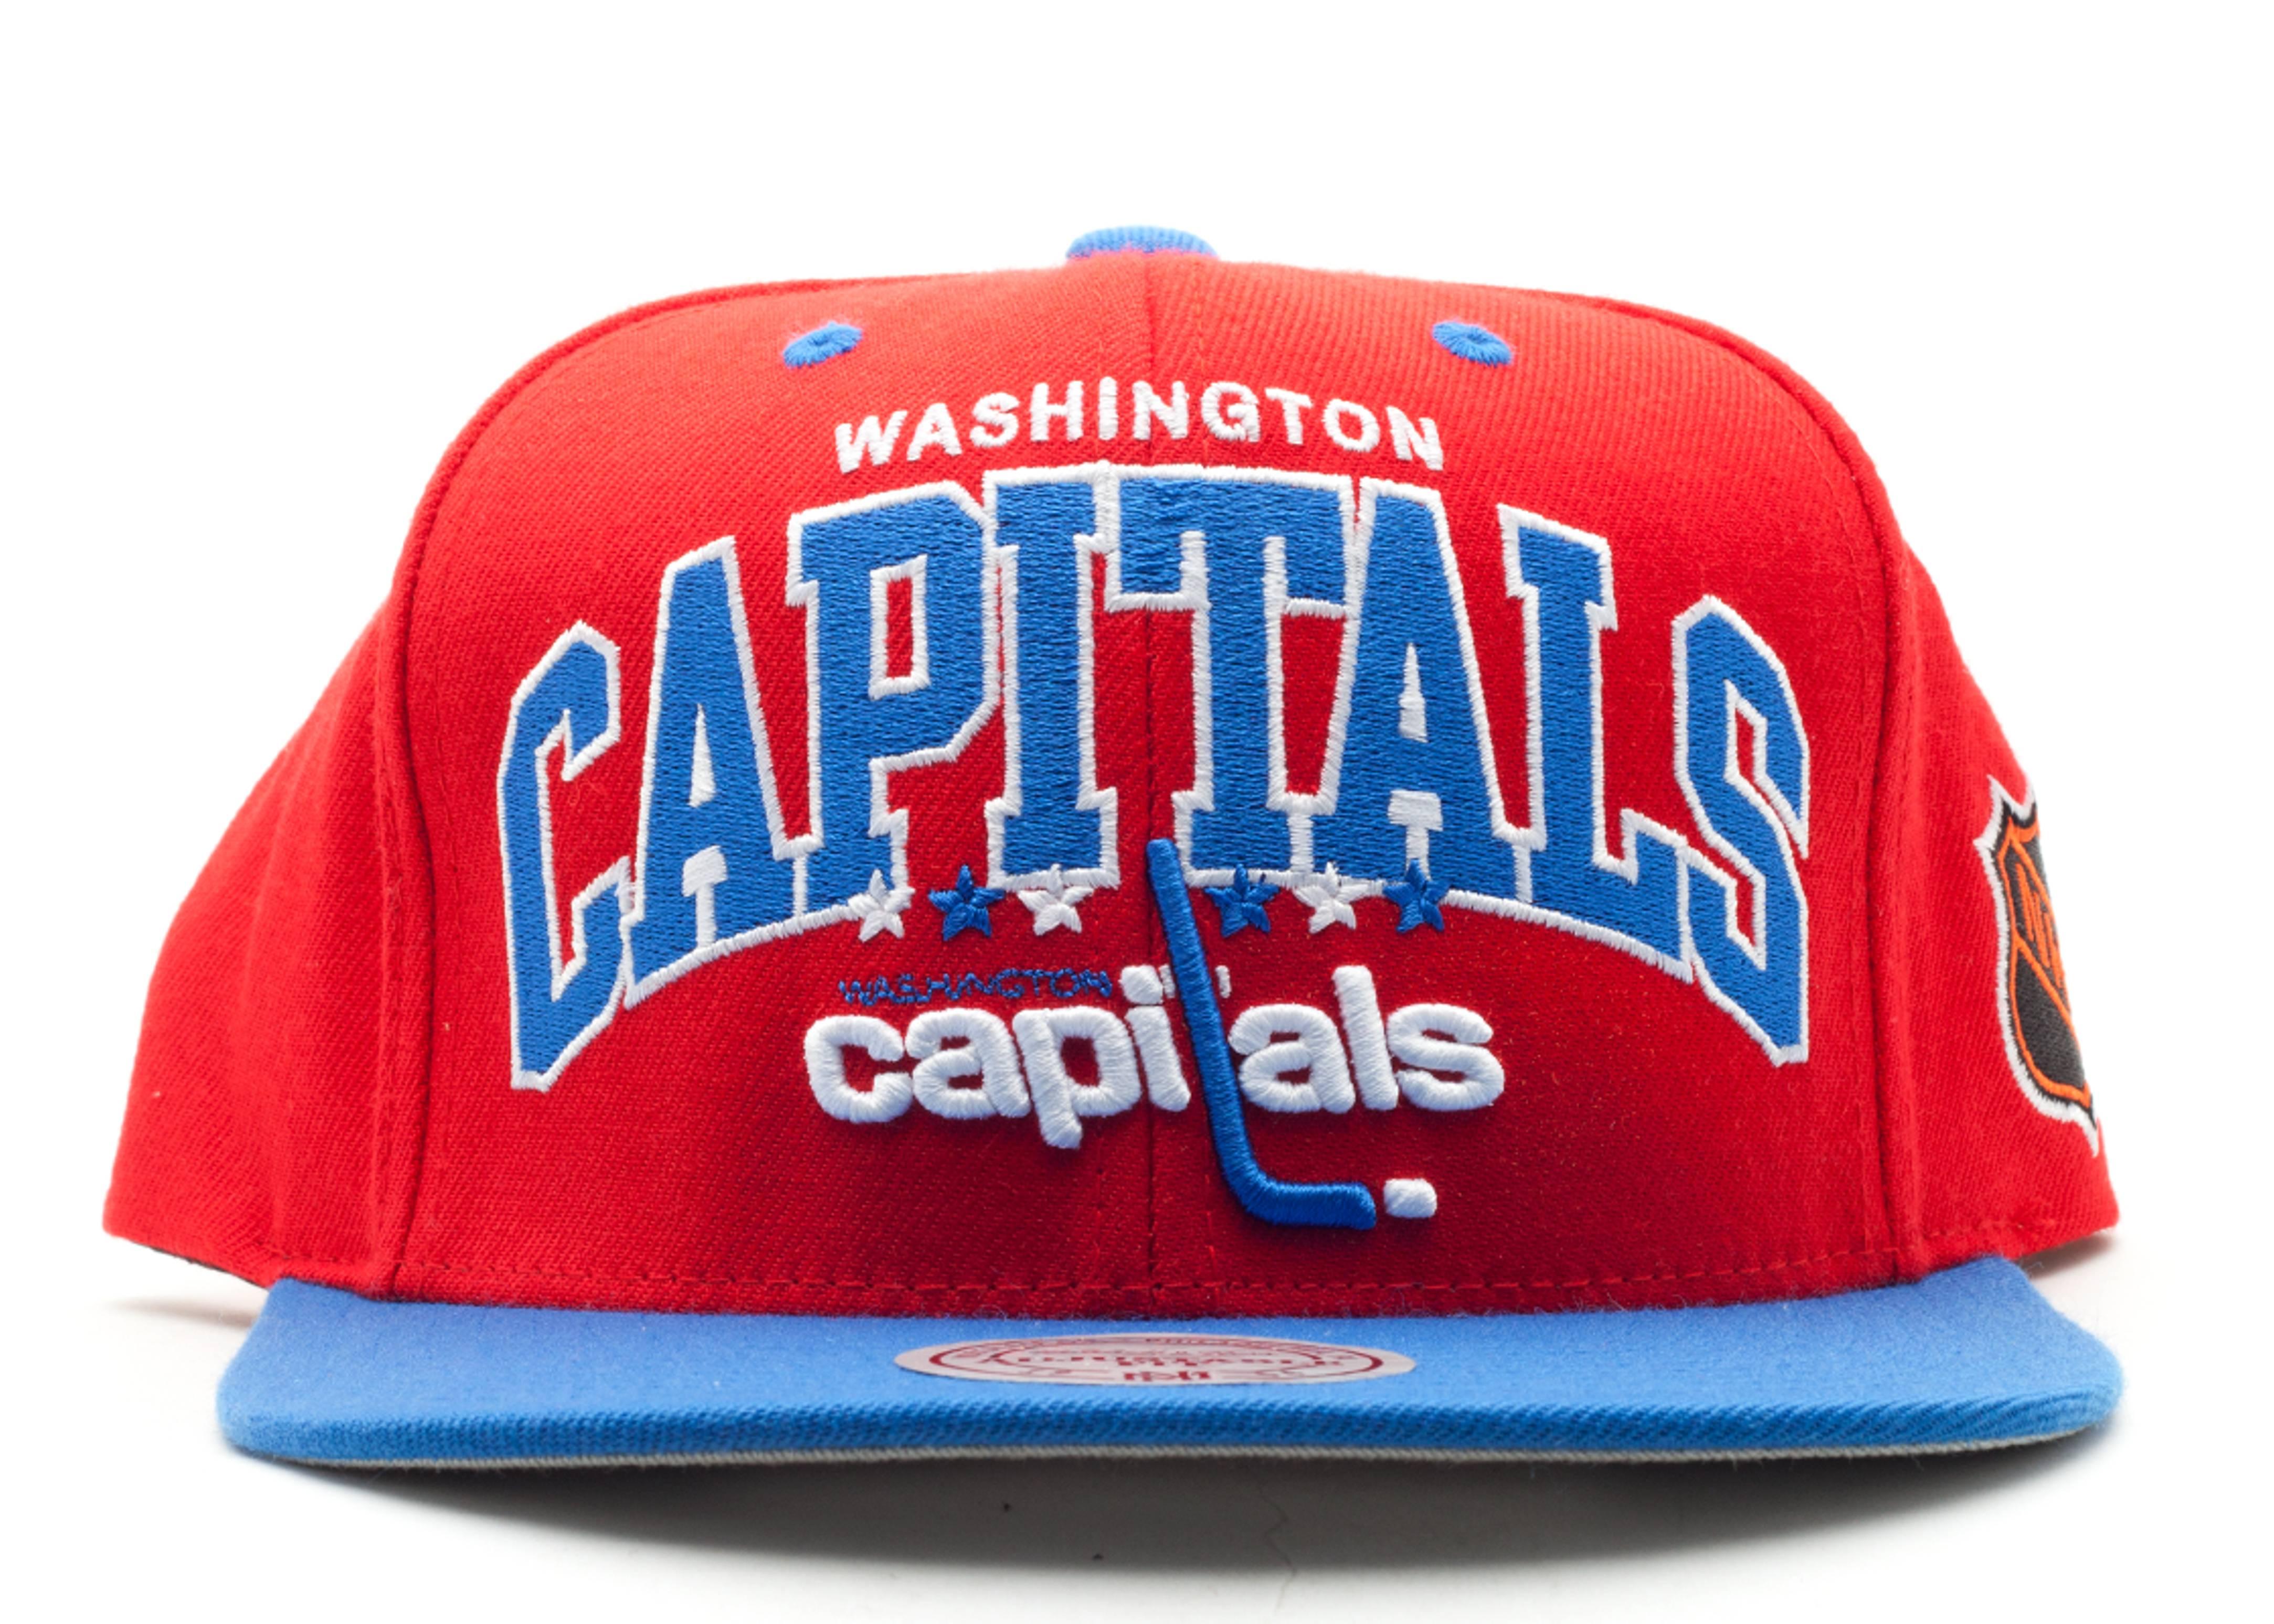 eashington captals snap-back